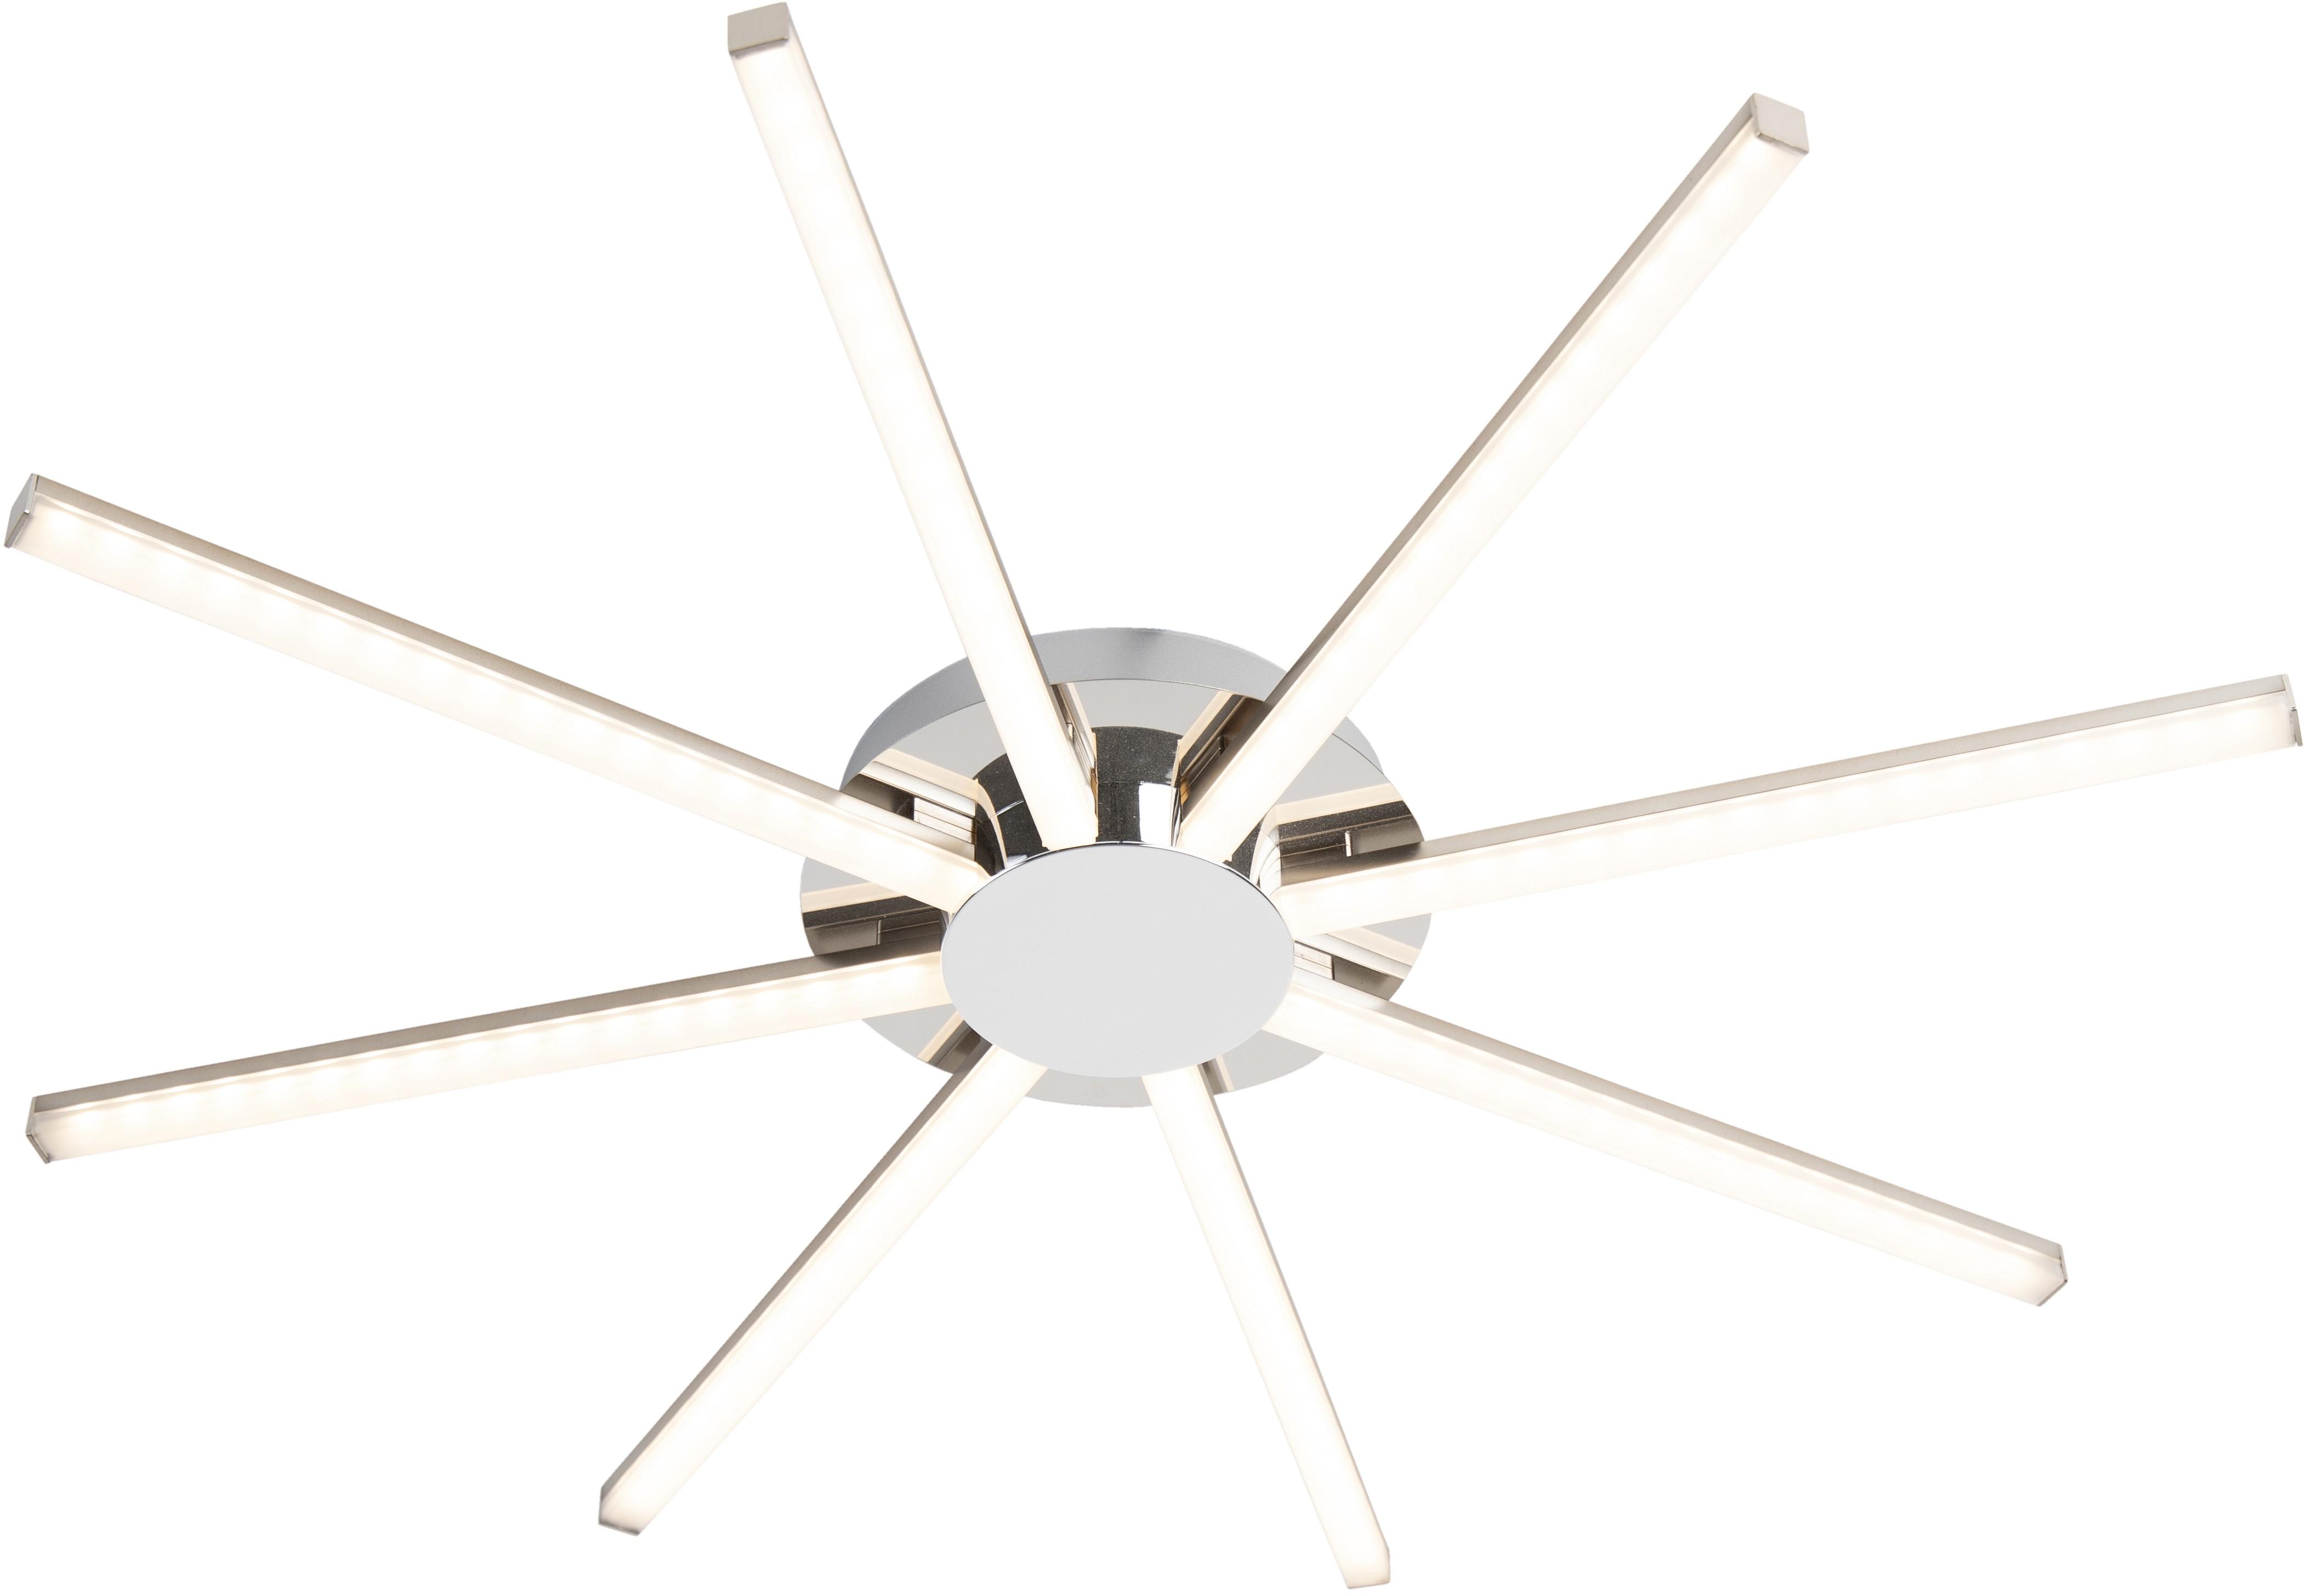 Leuchten Direct Designerski plafon stal zawiera LED - Simona otto